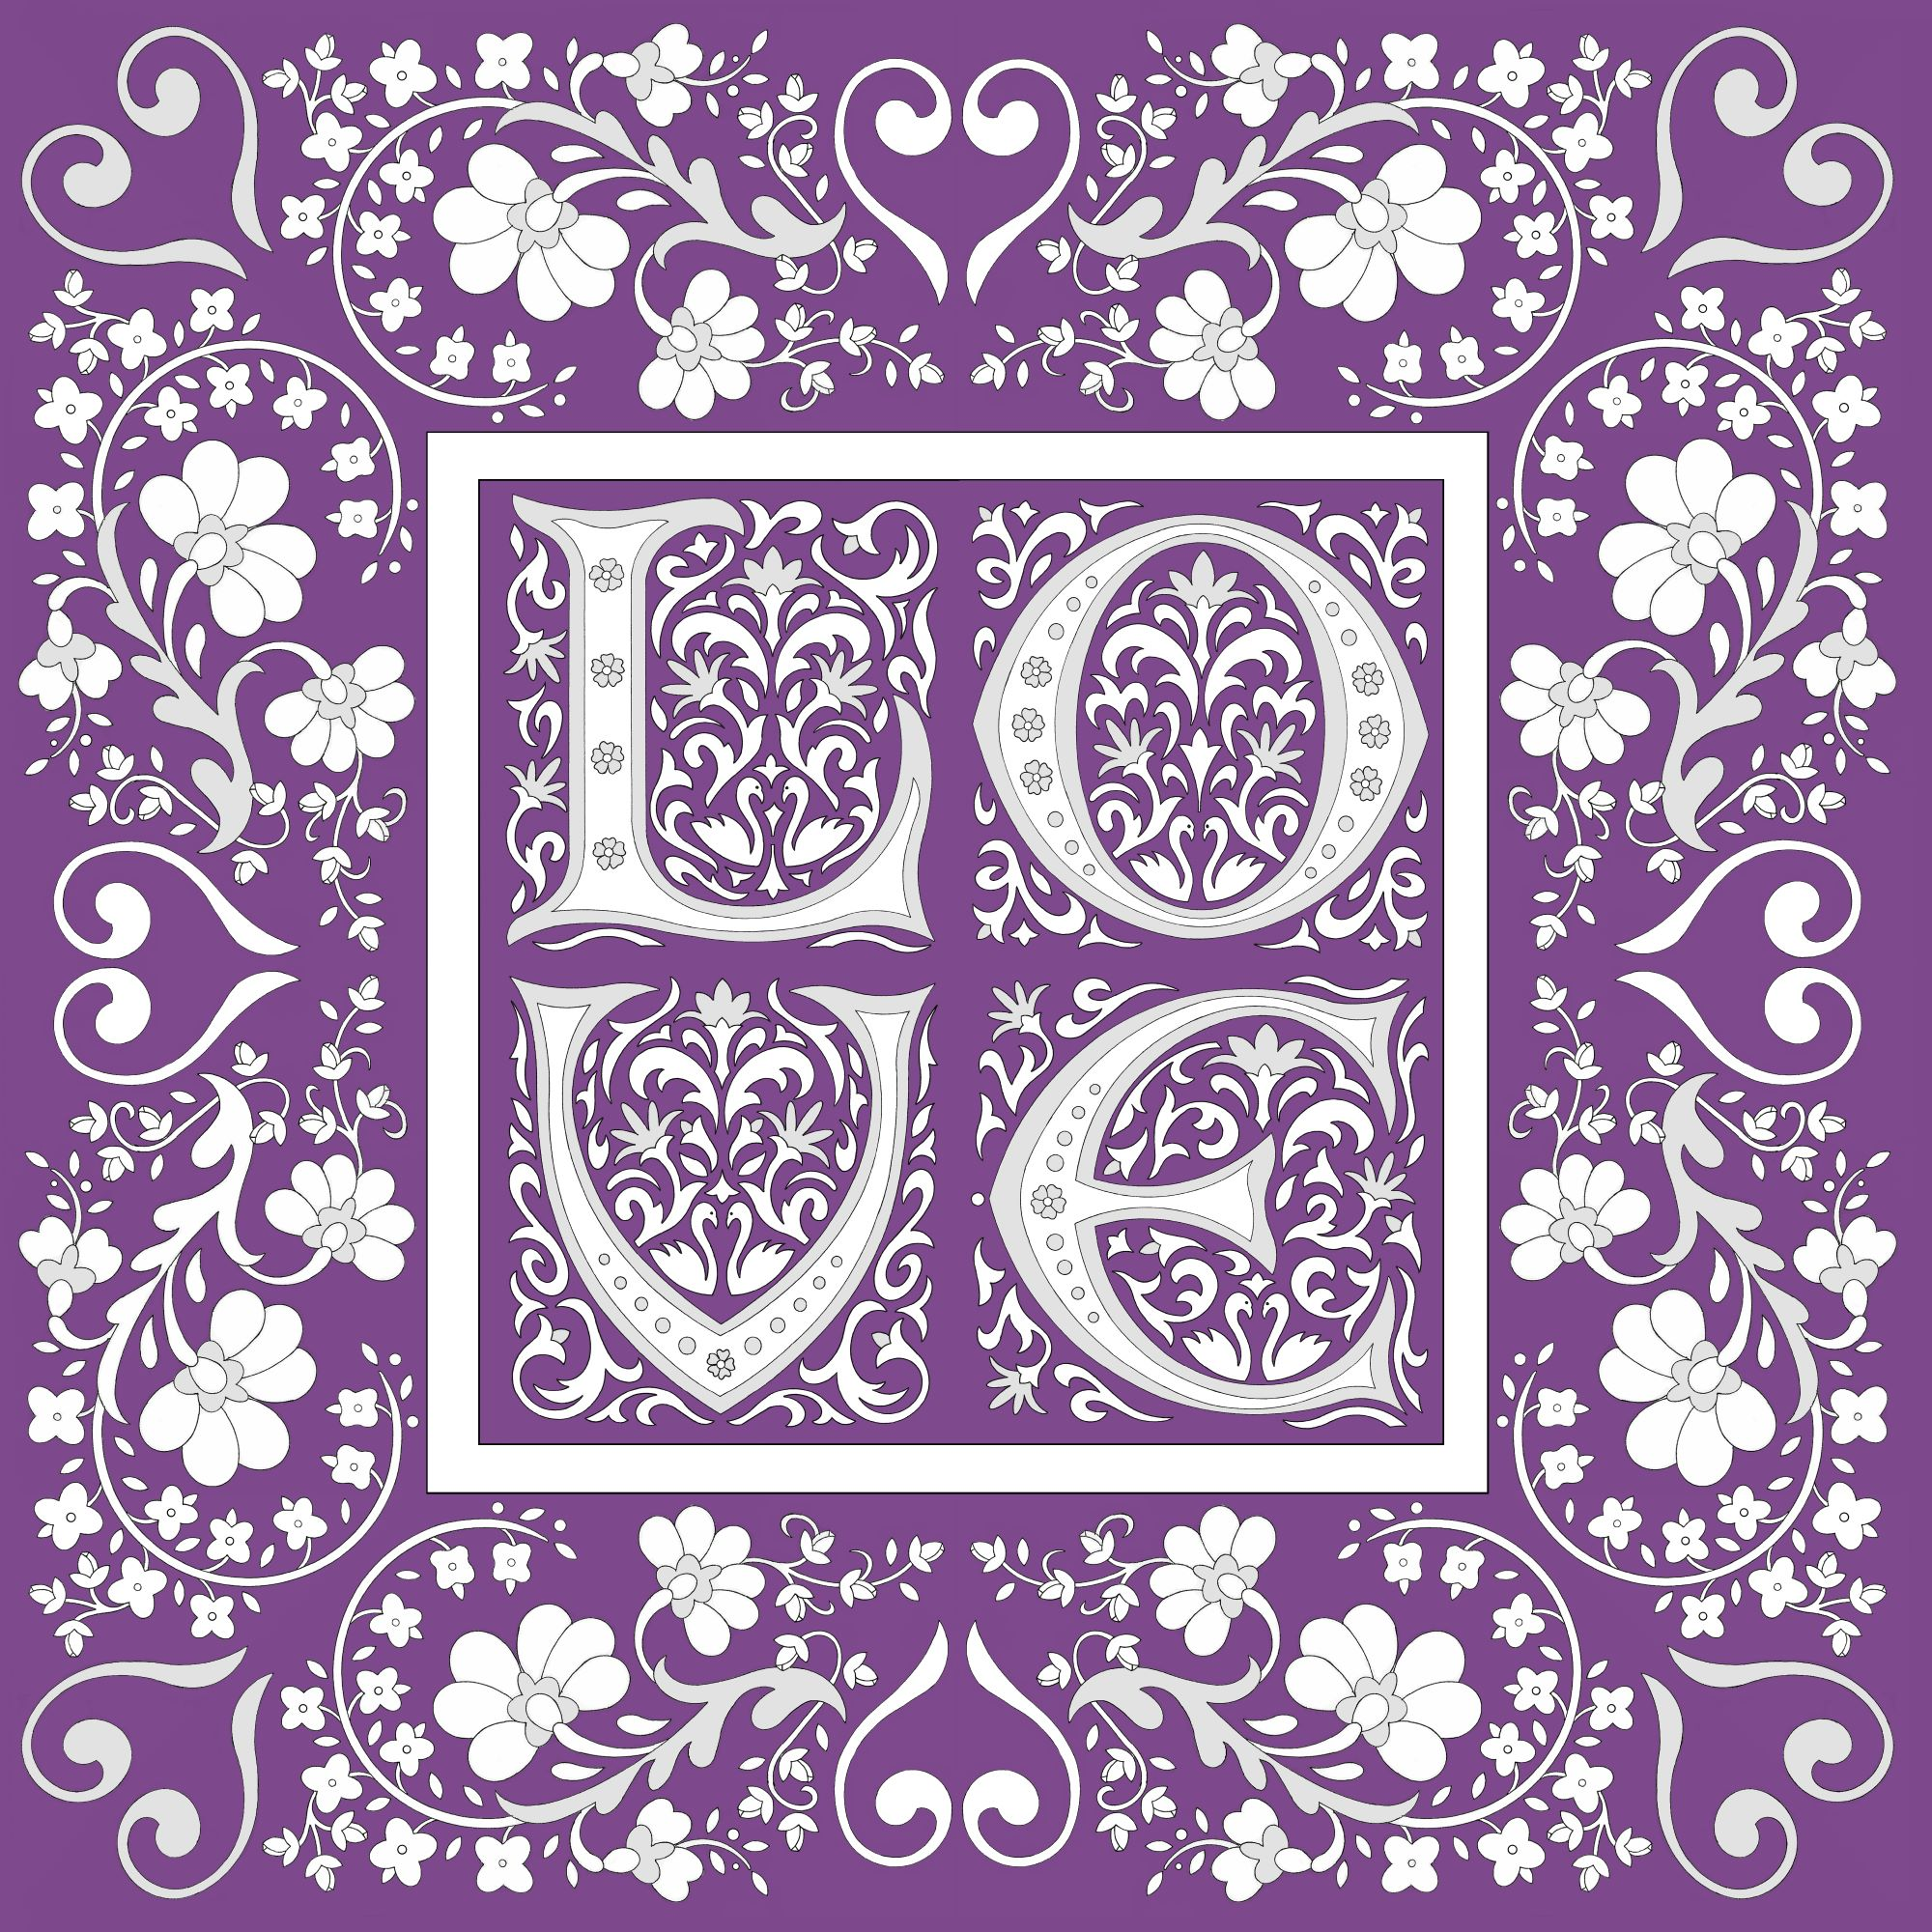 LOVE Letters Quilt (2-color) resized.jpg